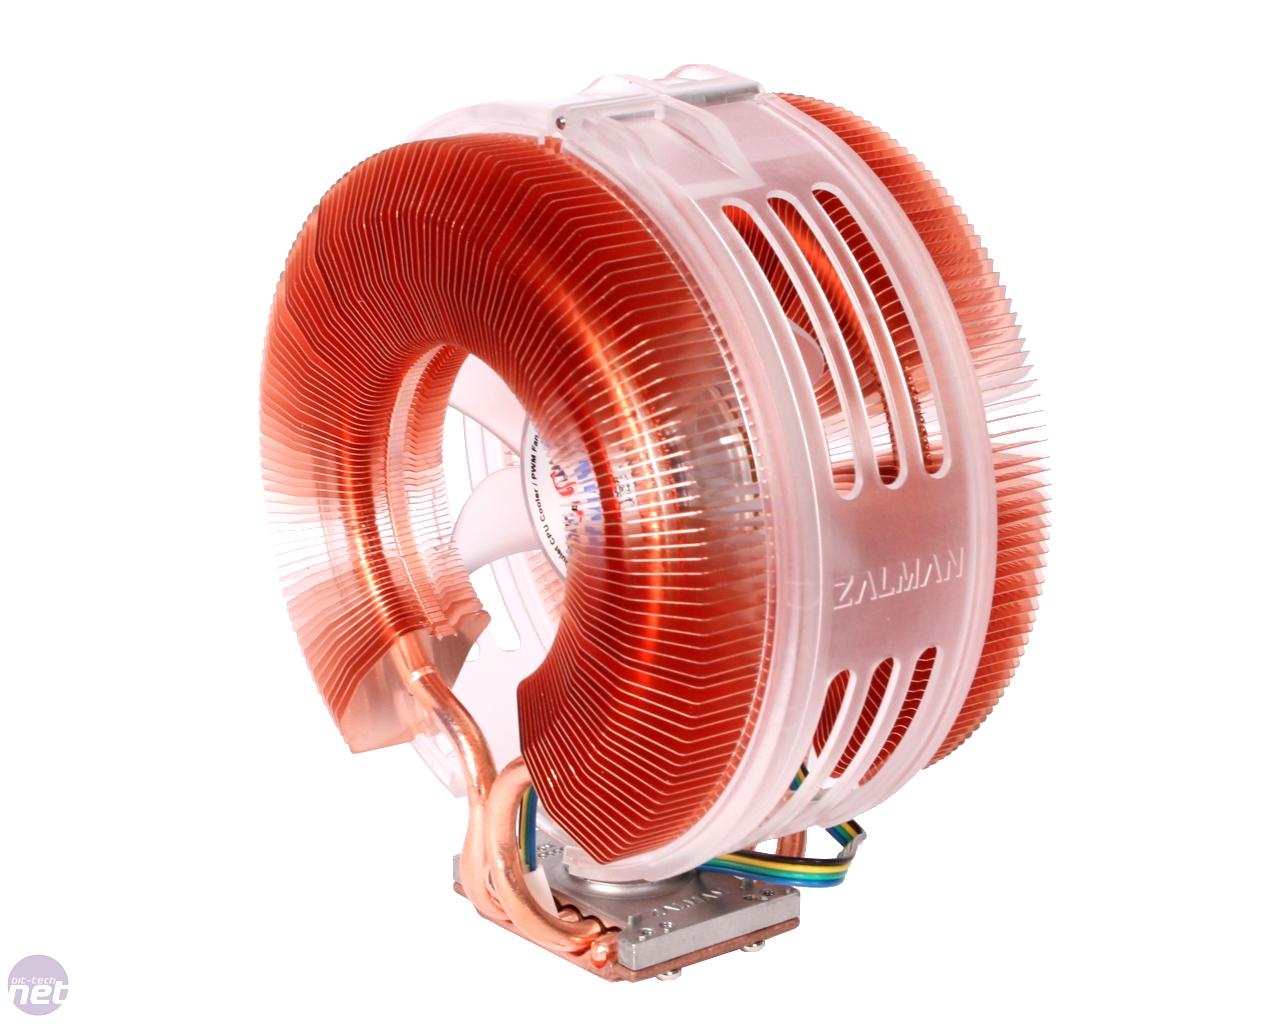 Zalman cooler mali oglasi goglasi zalman cnps9700 super aero flower coolers zalman hd500 home theatre pc cases